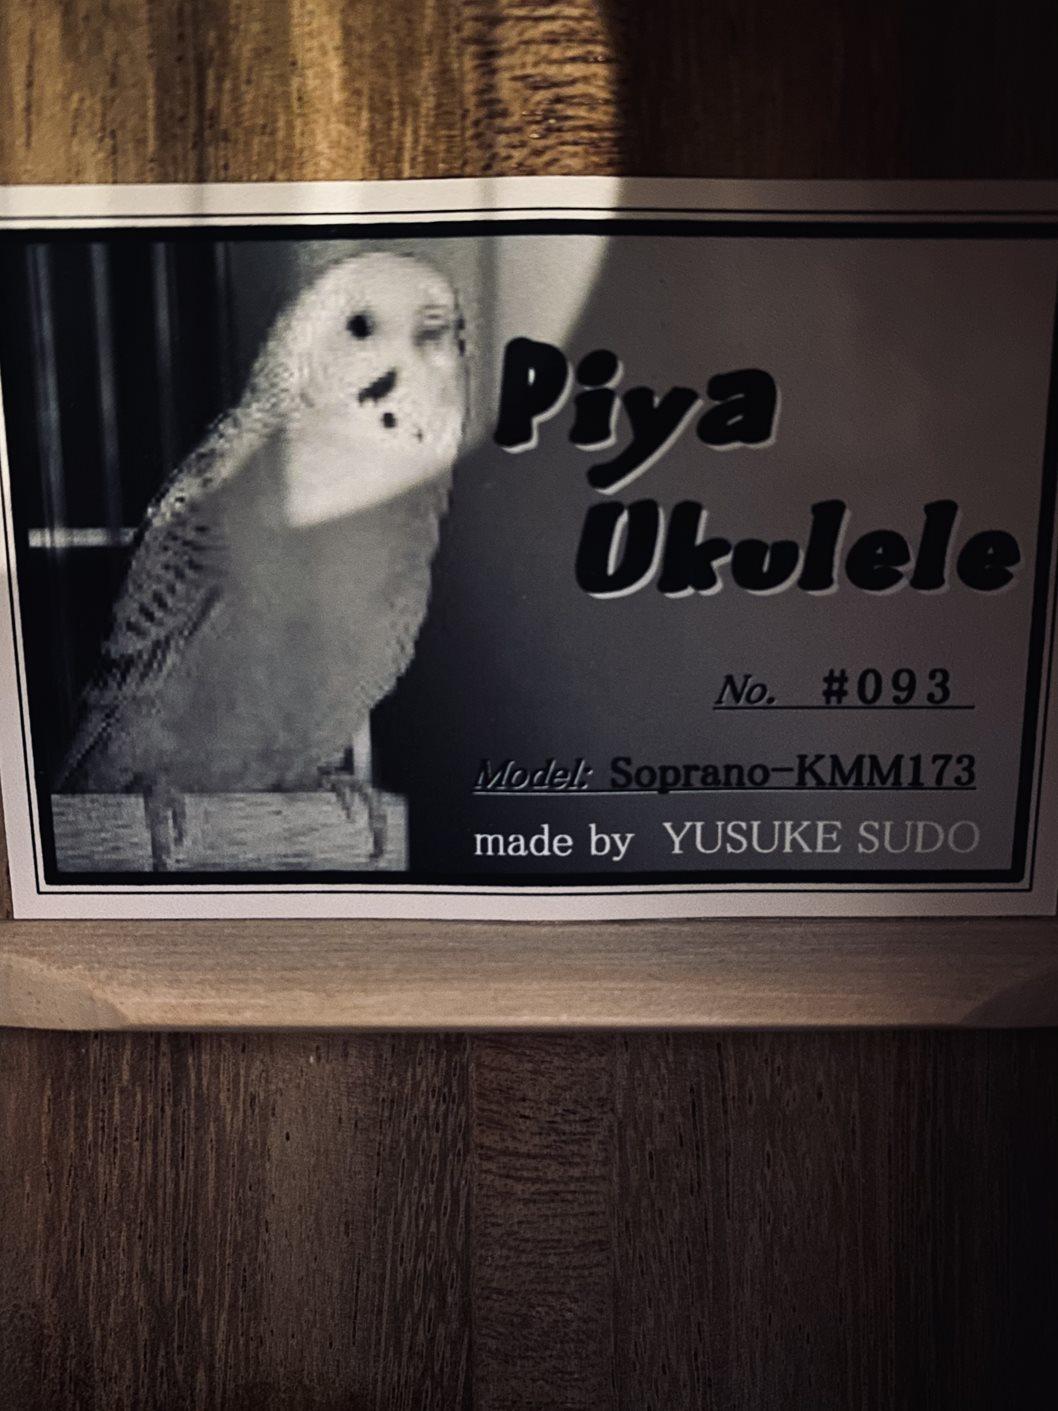 【Piya Ukulele】Sop-KMM173 #093 ソプラノサイズ